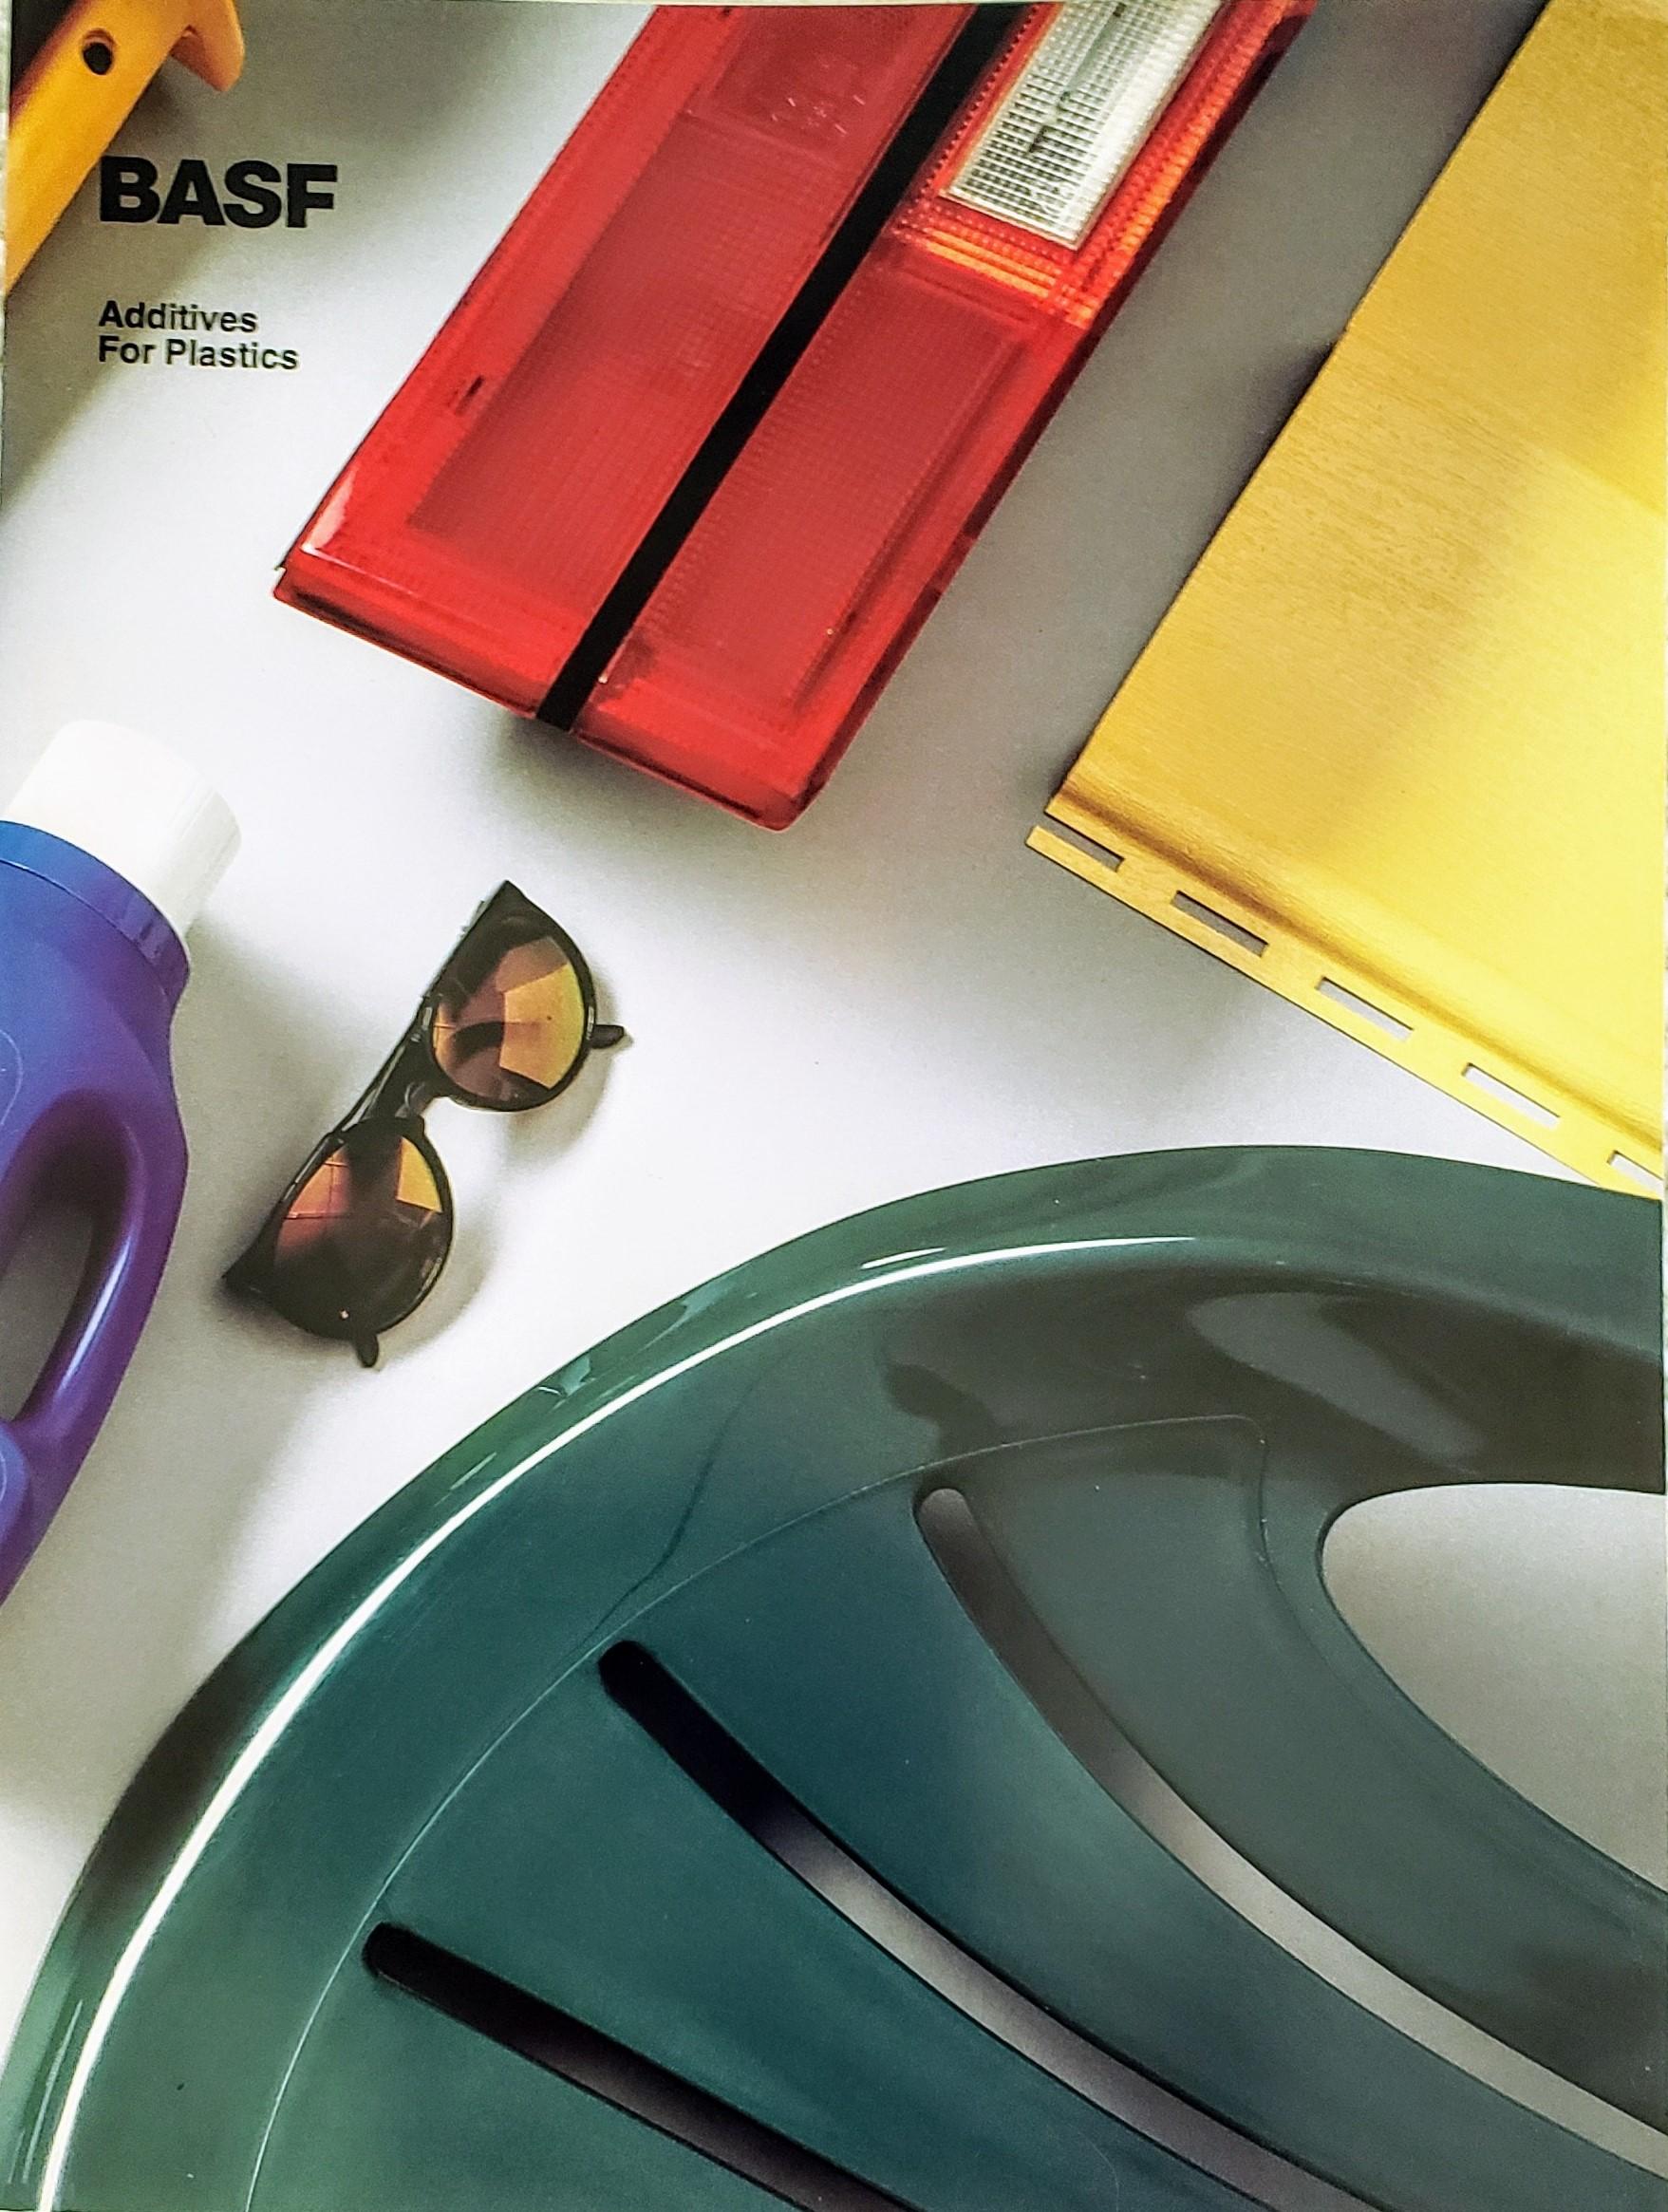 basf_additives_brochure_1